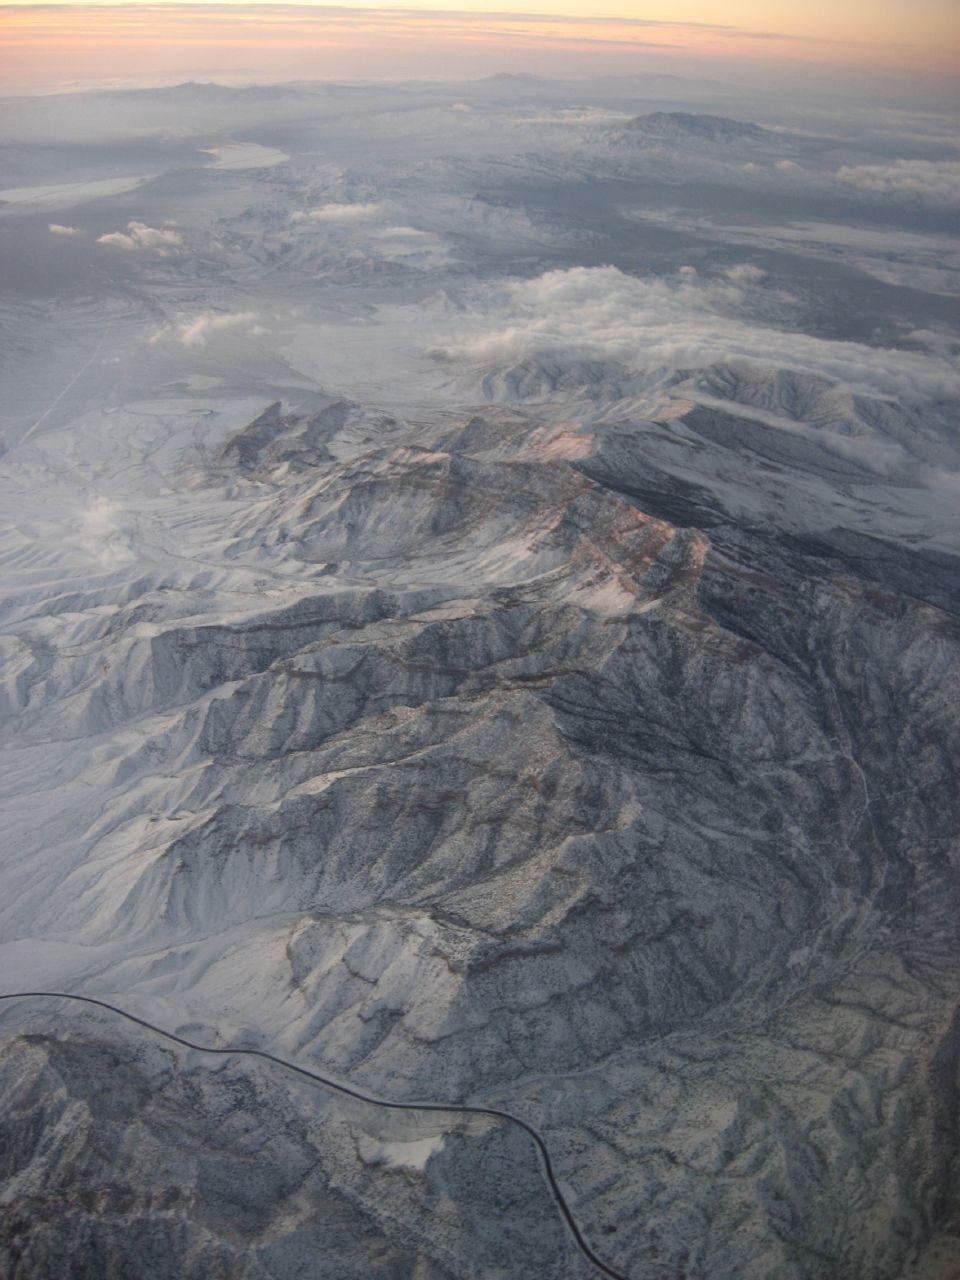 Pahrump To Las Vegas >> File:Mount Potosi, State Route 160 Between Las Vegas and Pahrump, Nevada (3124835775).jpg ...